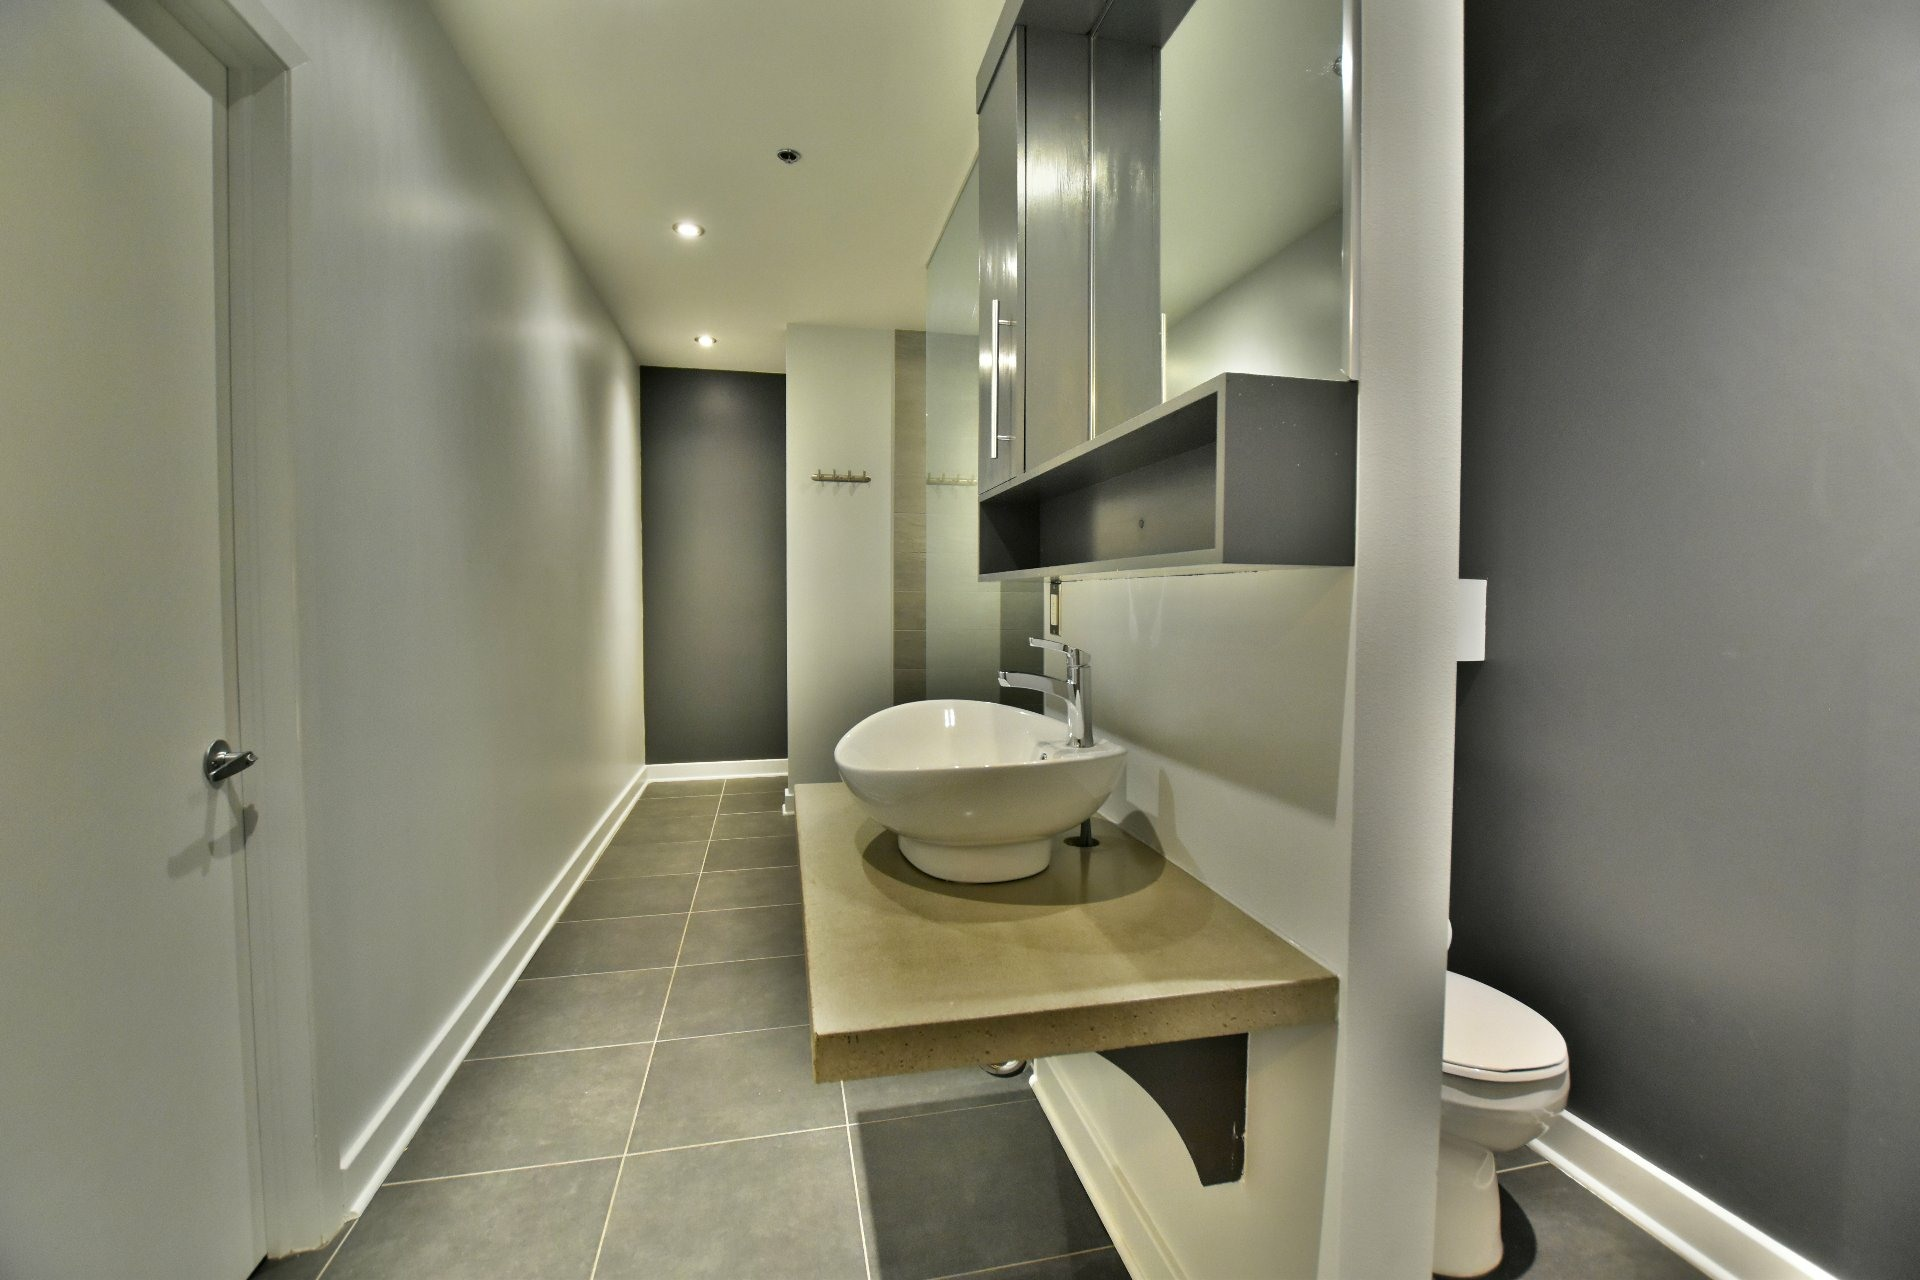 image 8 - Departamento Para alquiler Villeray/Saint-Michel/Parc-Extension Montréal  - 5 habitaciones